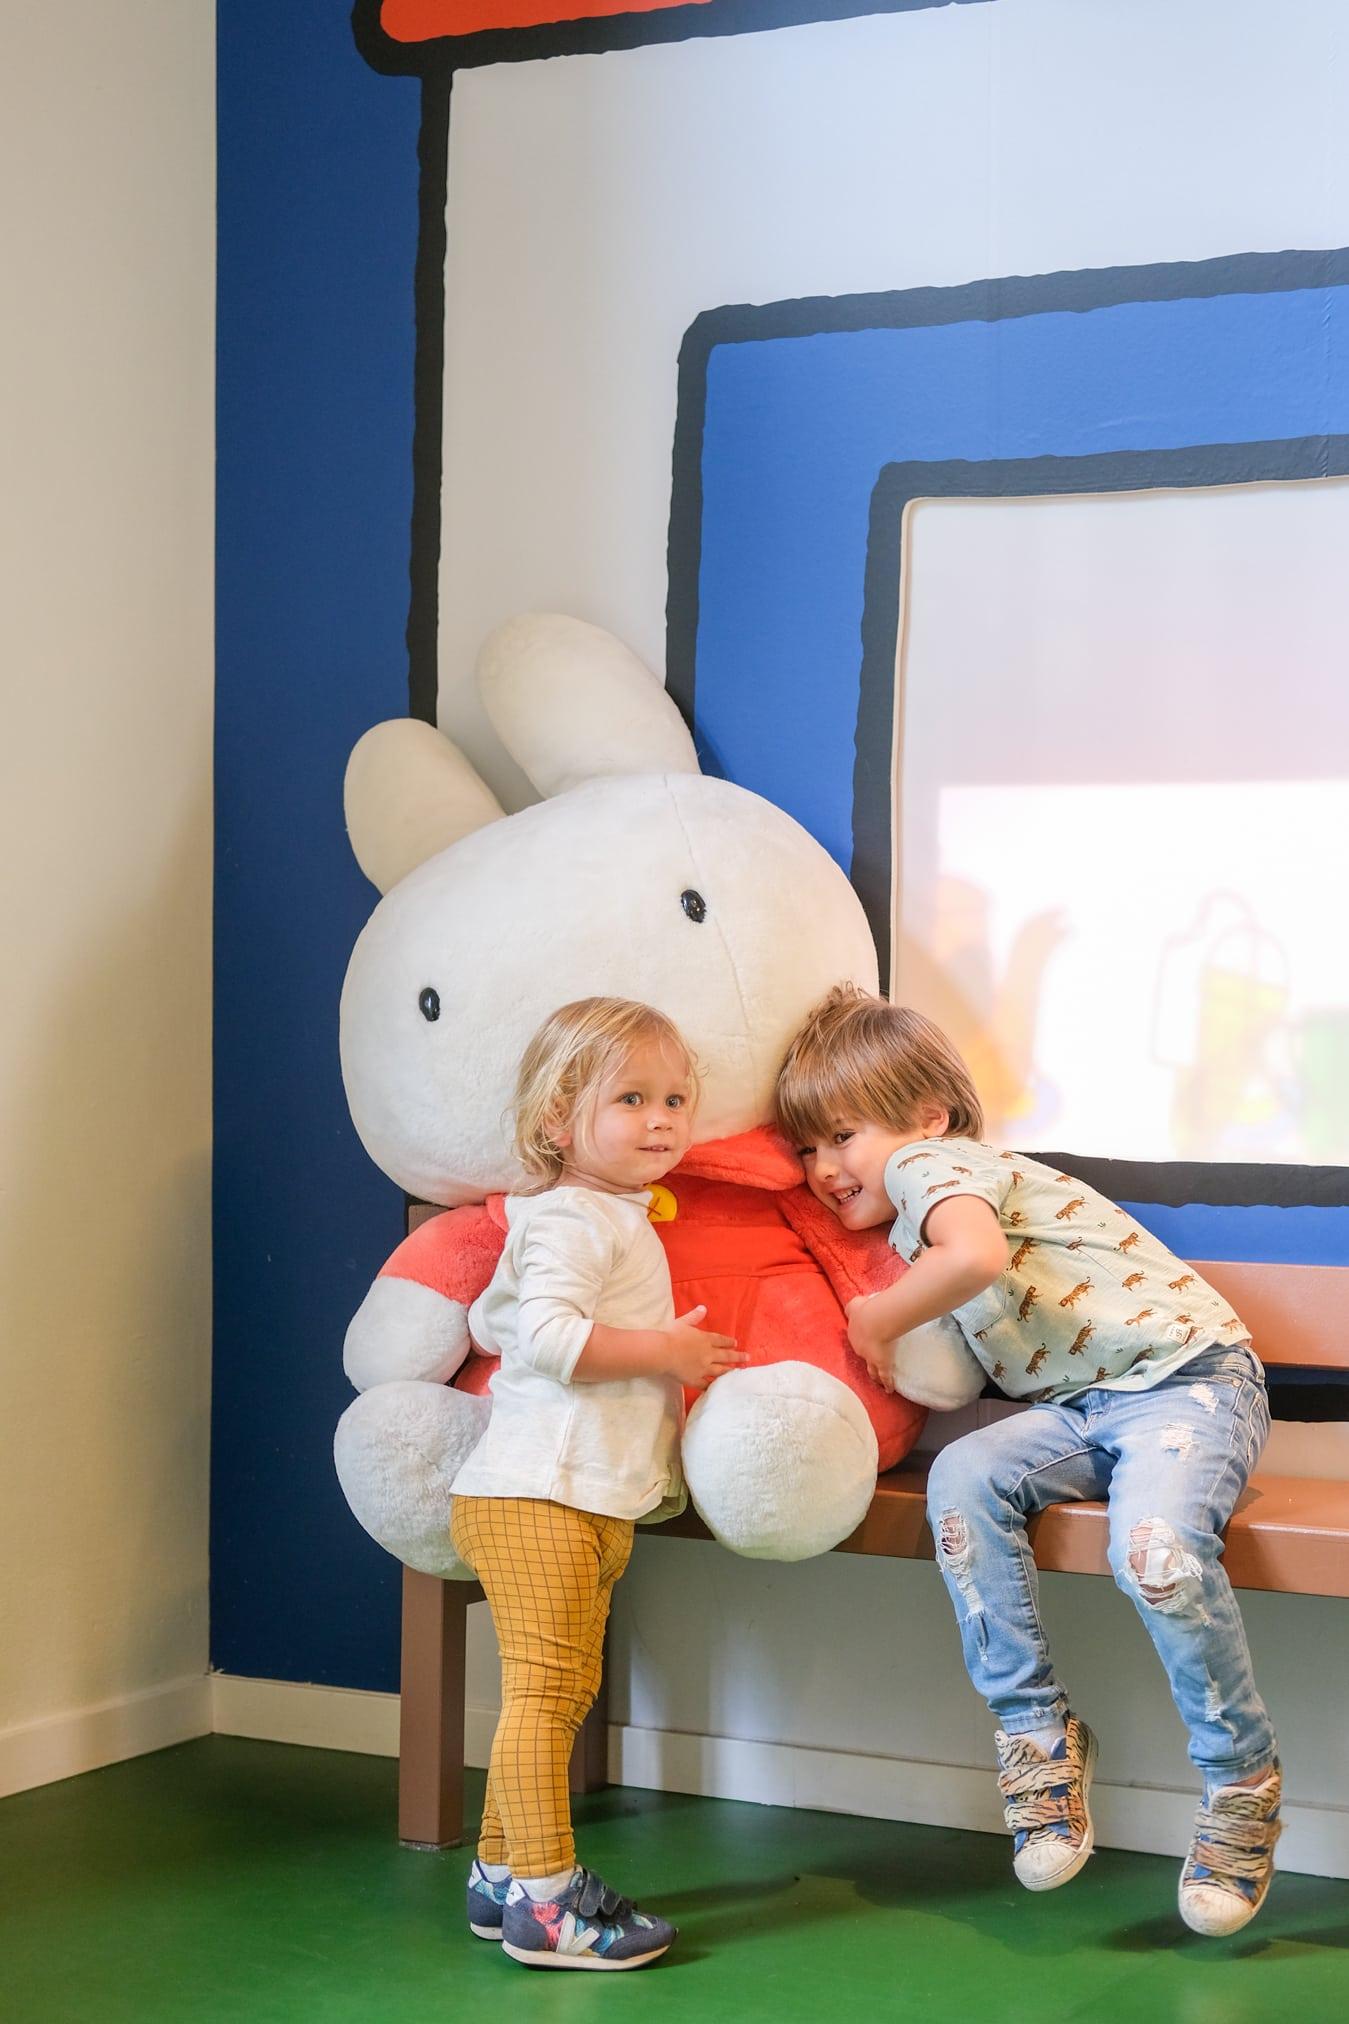 miffy museum utrecht netherlands